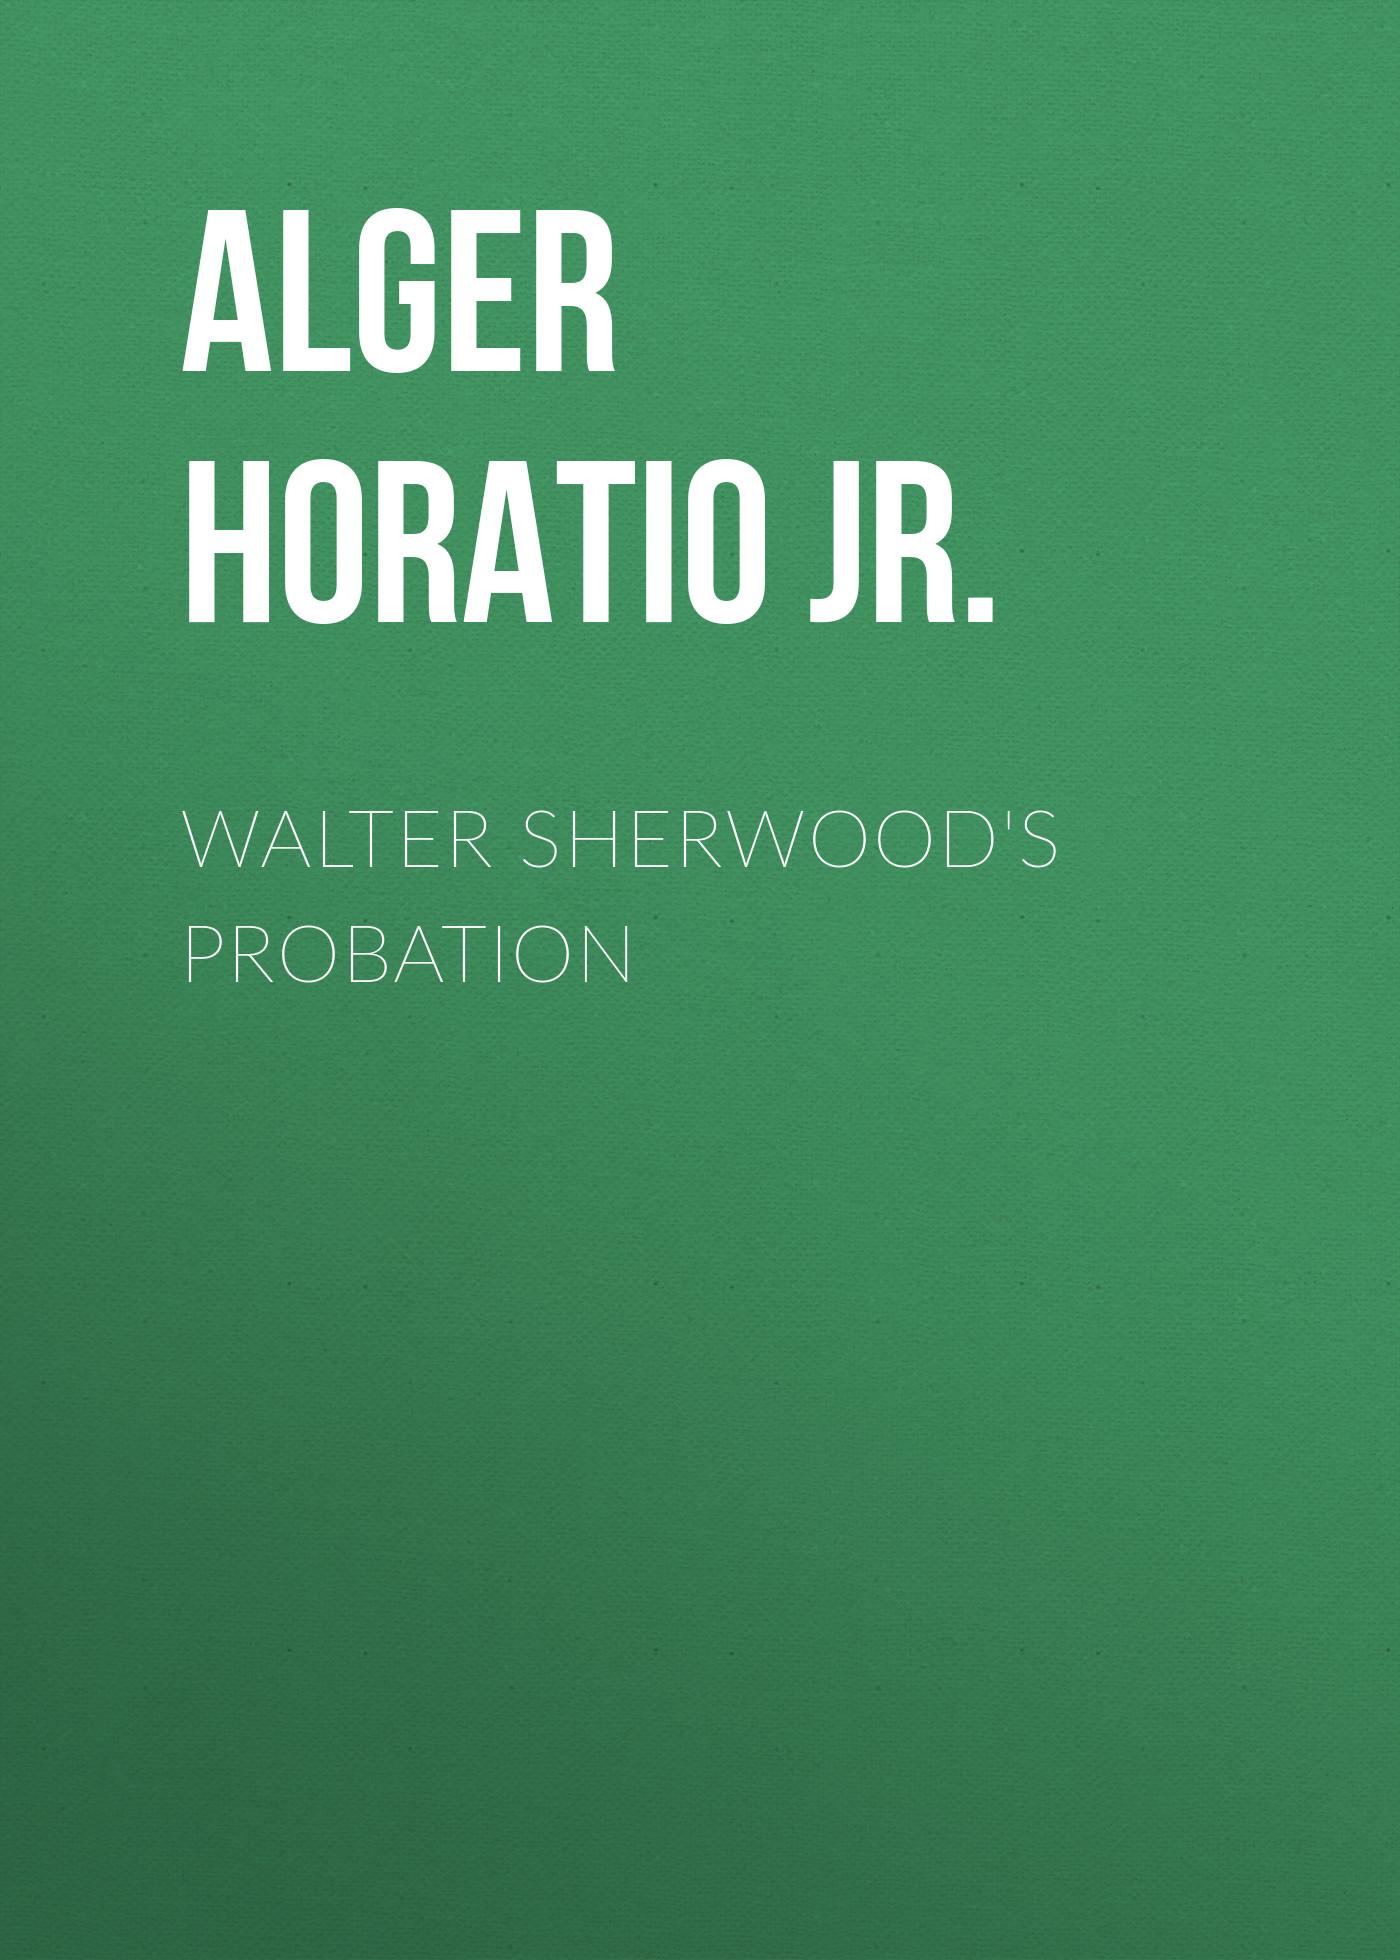 Alger Horatio Jr. Walter Sherwood's Probation alger horatio jr luke walton